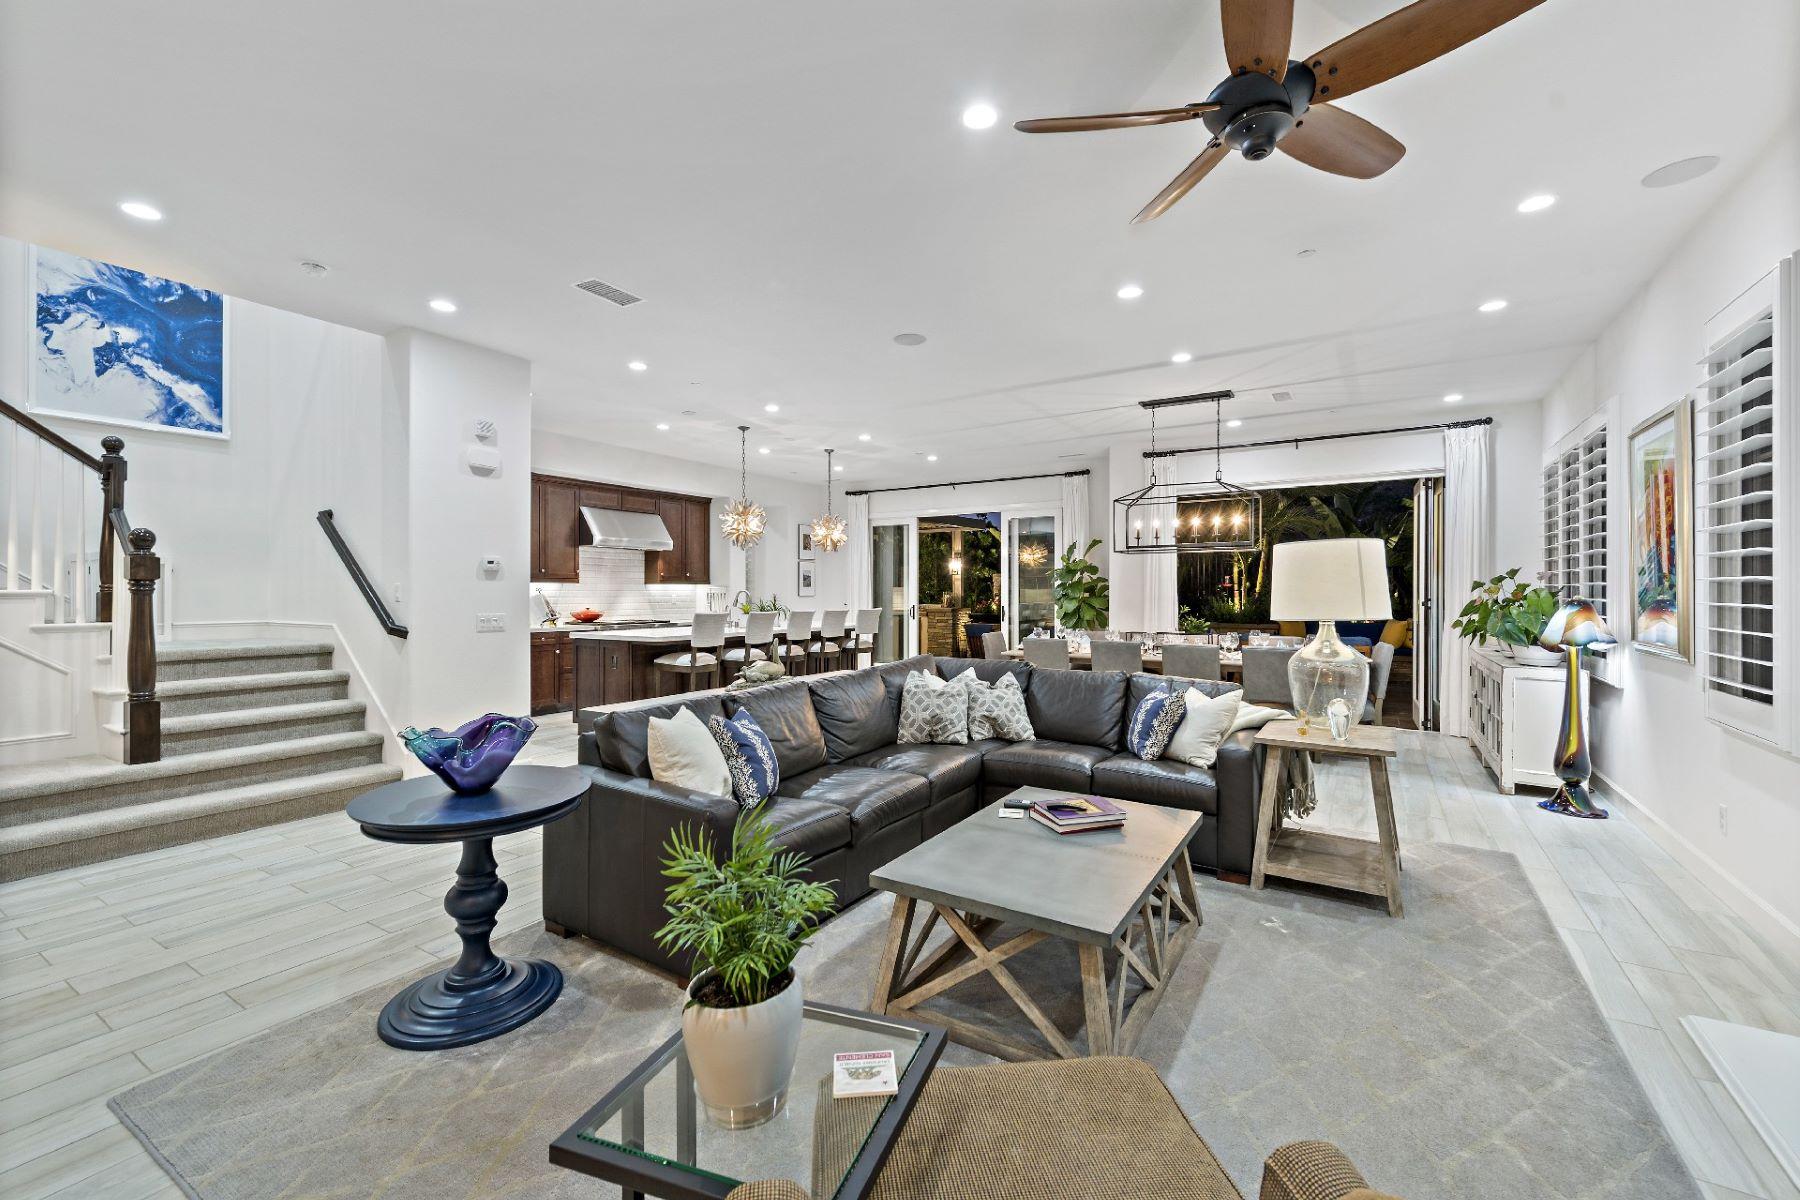 Single Family Homes for Active at 109 Via Bellas Artes 109 Via Bellas Artes San Clemente, California 92672 United States